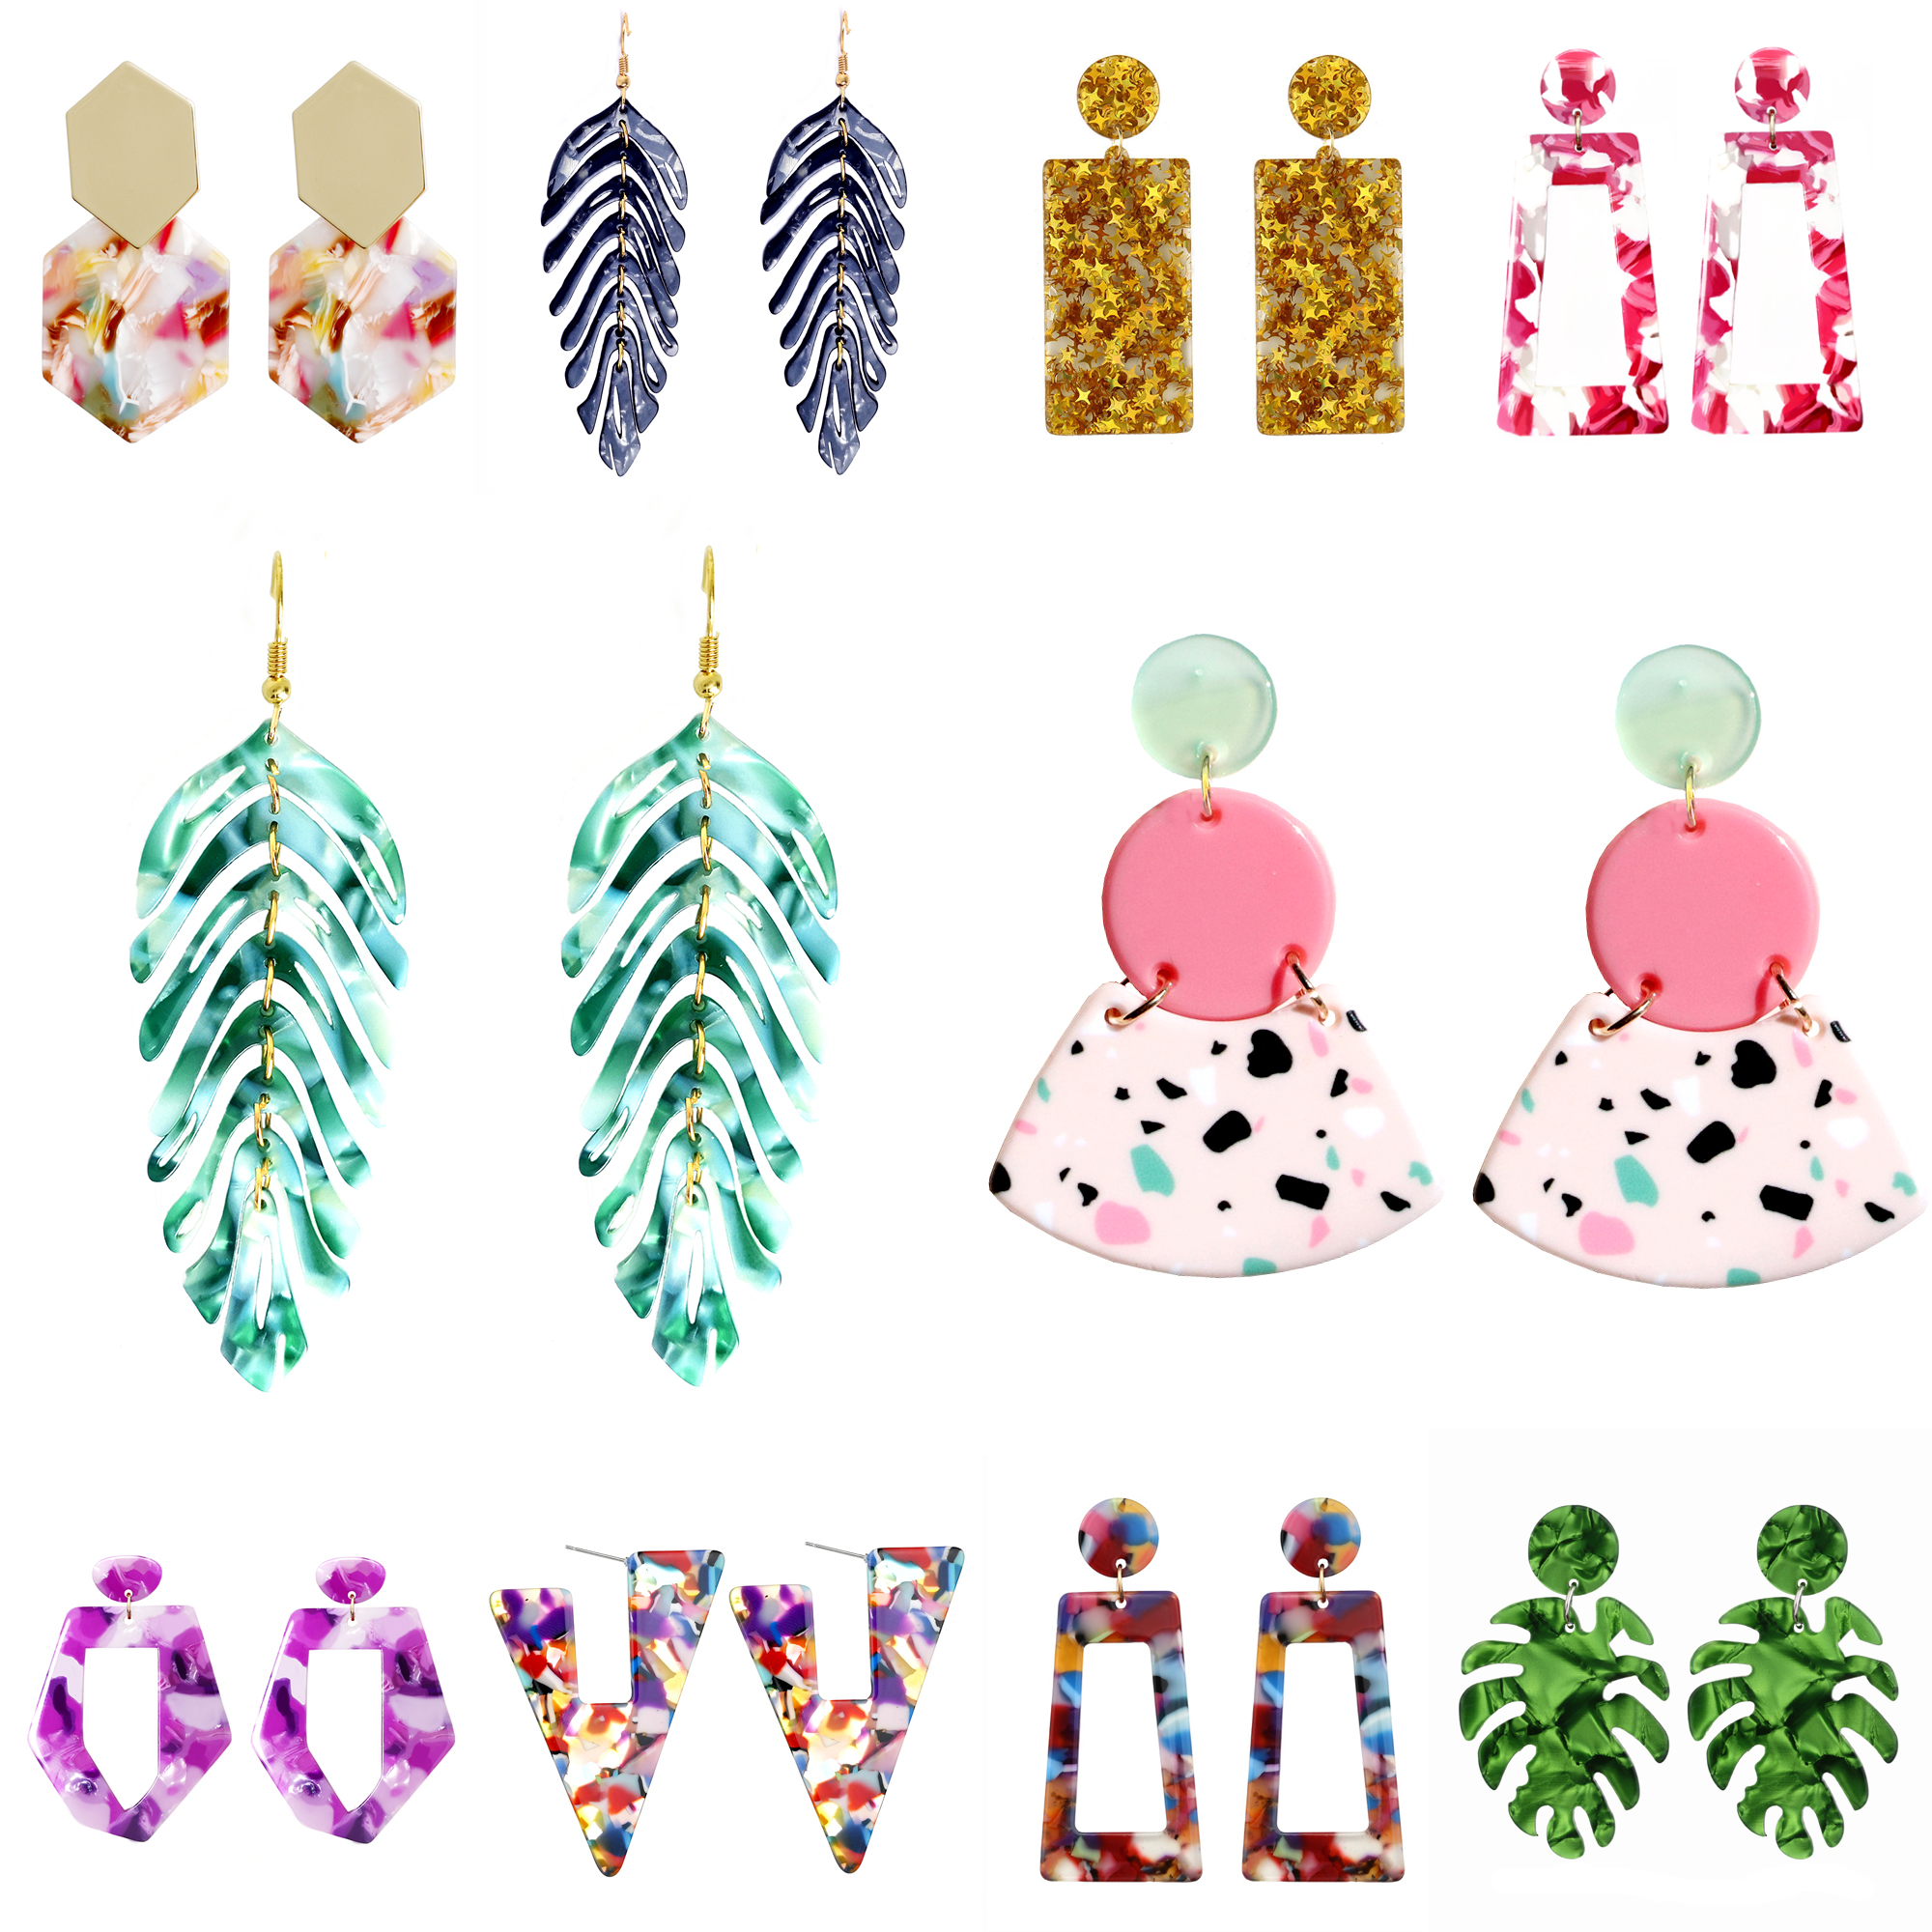 Earrings for Geometry Leaf Drop-Hanging Beautiful Girls Fashion Trend Colorful Women